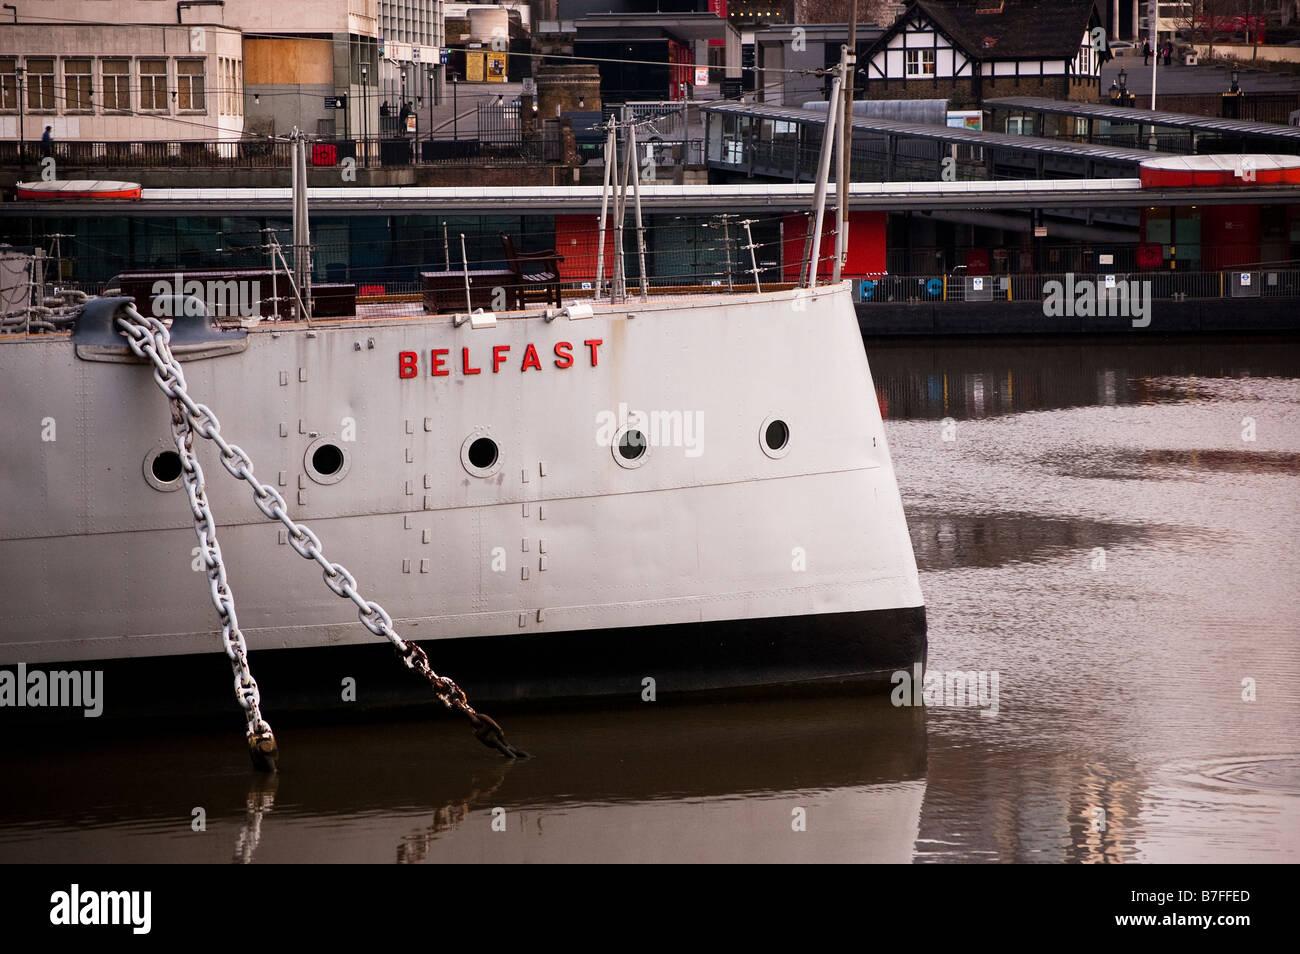 Stern of HMS Belfast - Stock Image